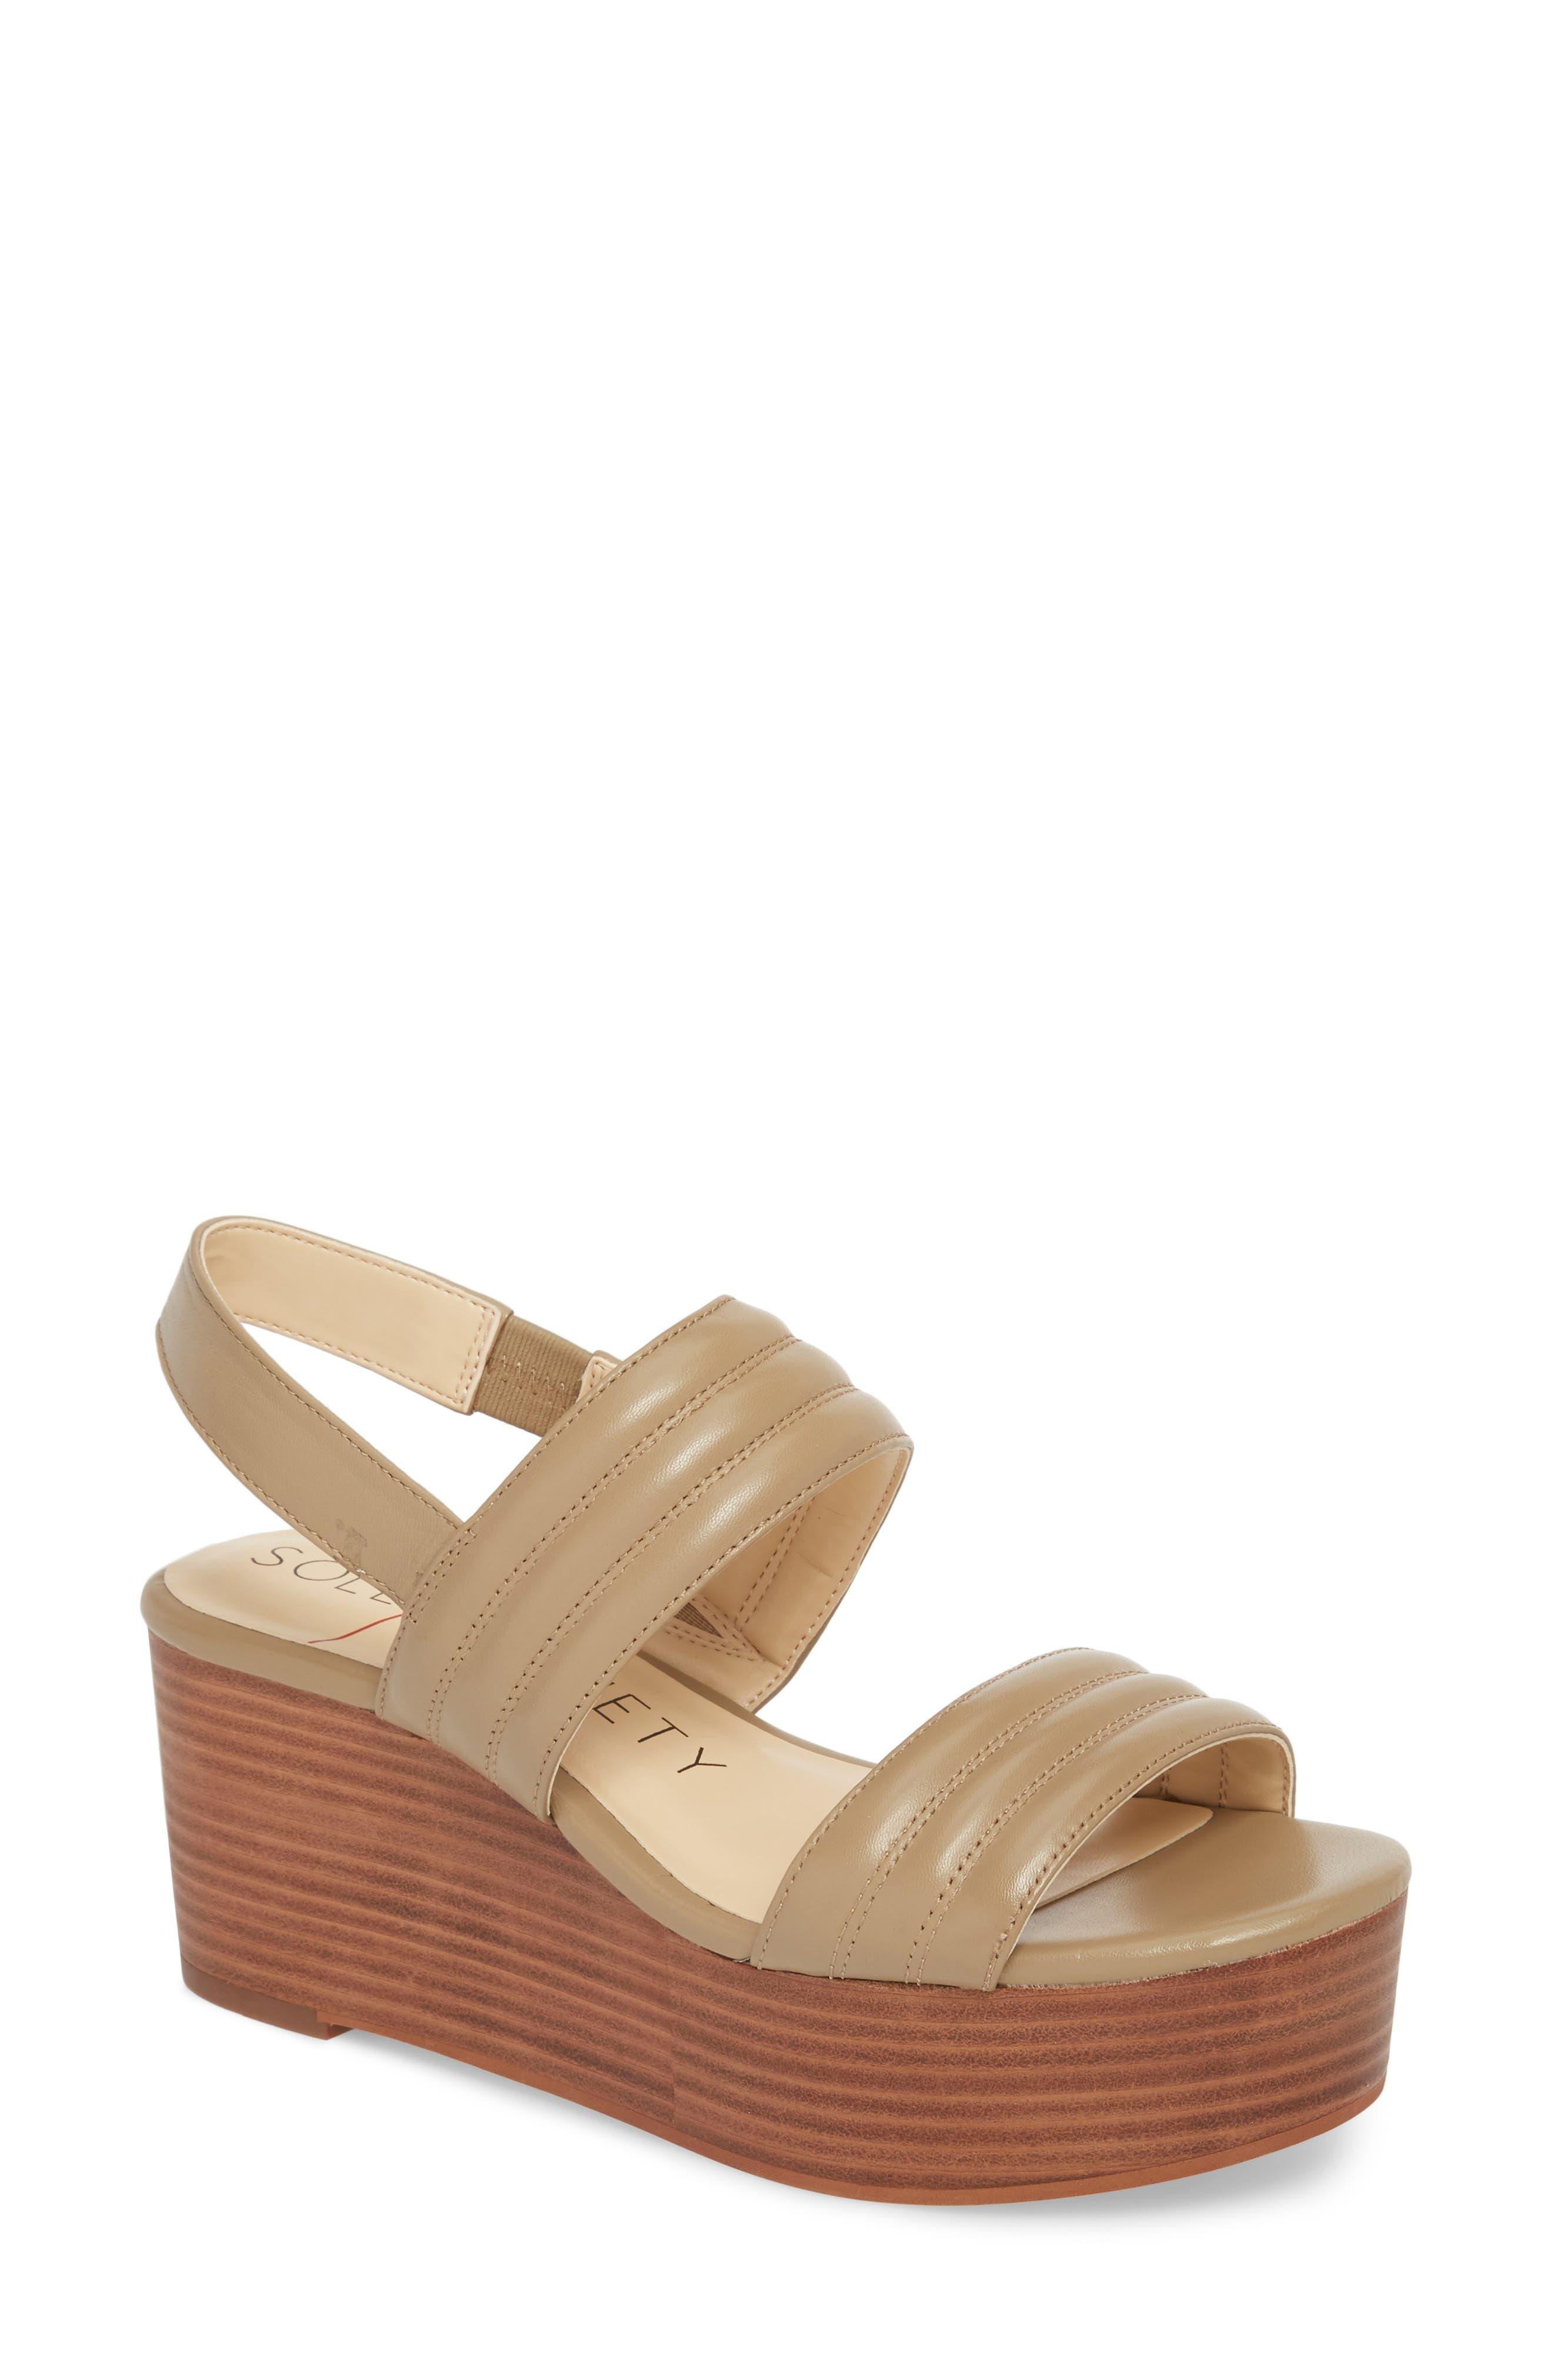 Amberly Platform Sandal,                         Main,                         color, 200